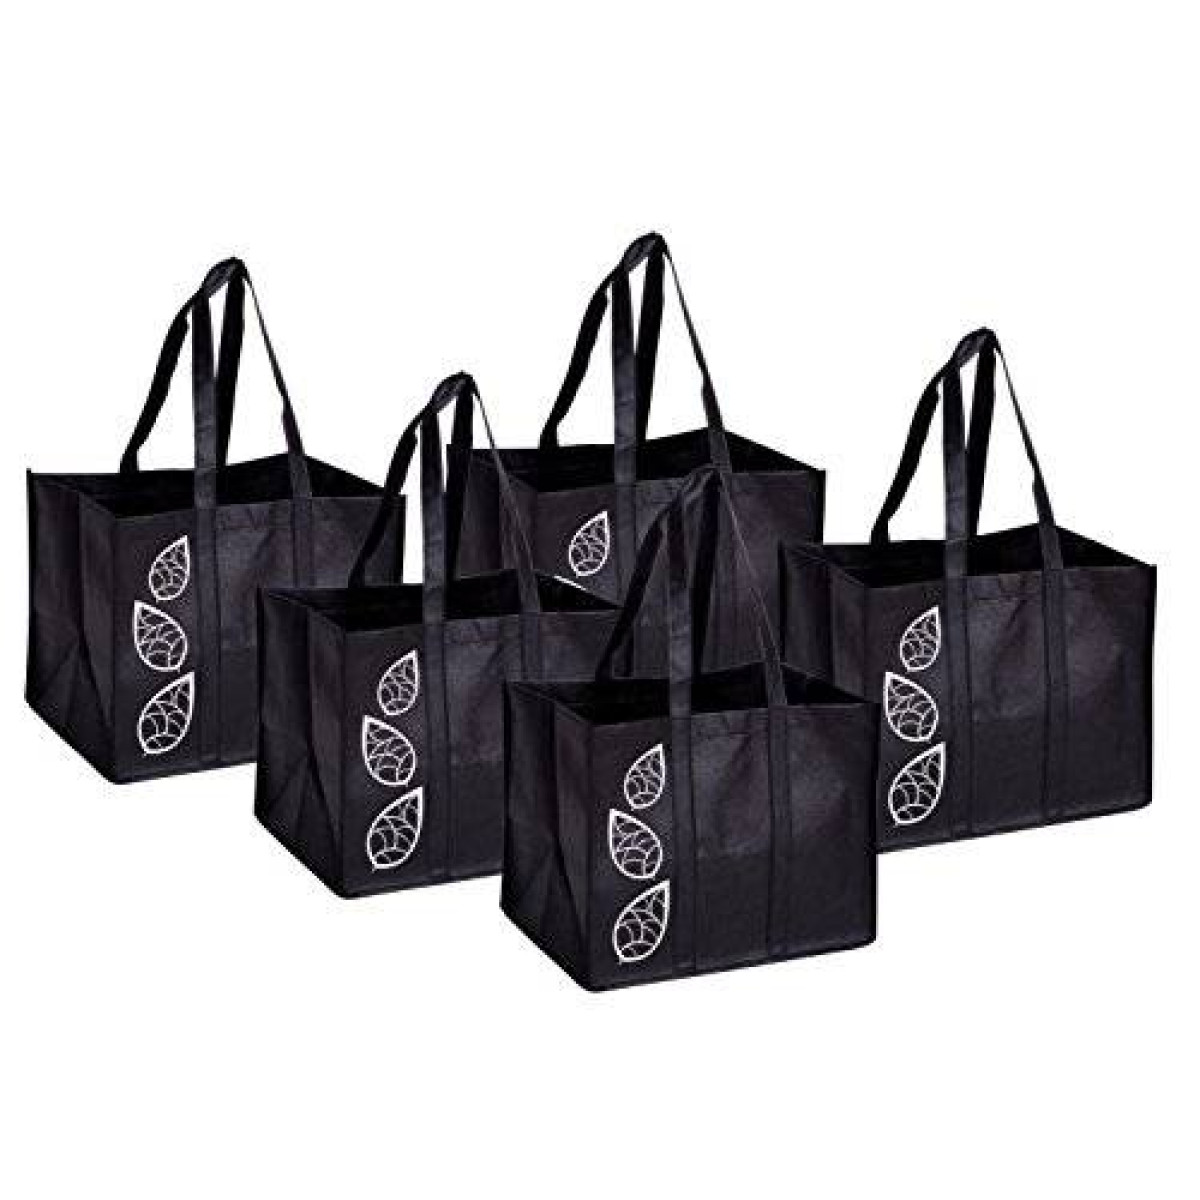 c4e222466b Bekith 5 Piece Large Collapsible Shopping Bags Set,Black Reusable ...